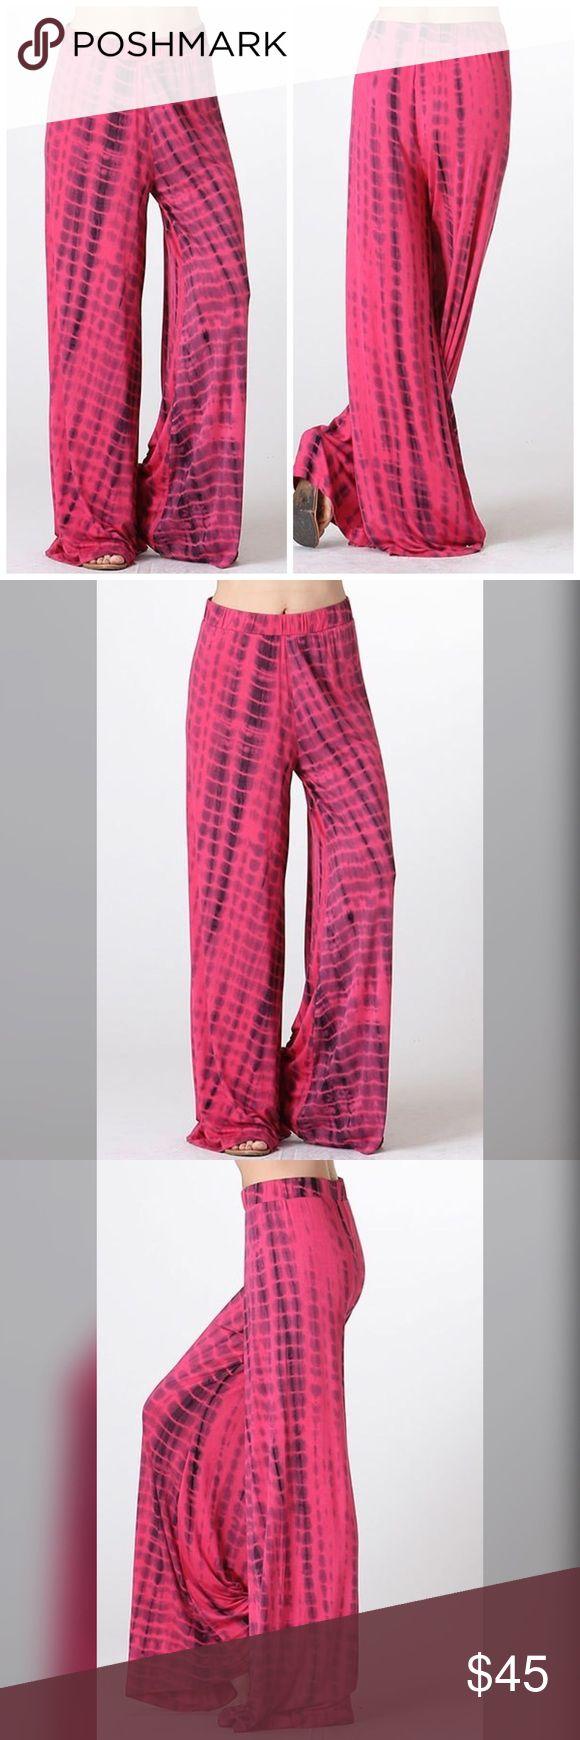 Cotton Palazzo Pants FUCHSIA (ELASTIC WAISTBAND TIE DYE PANTS) 95% RAYON 5% SPANDEX Pants